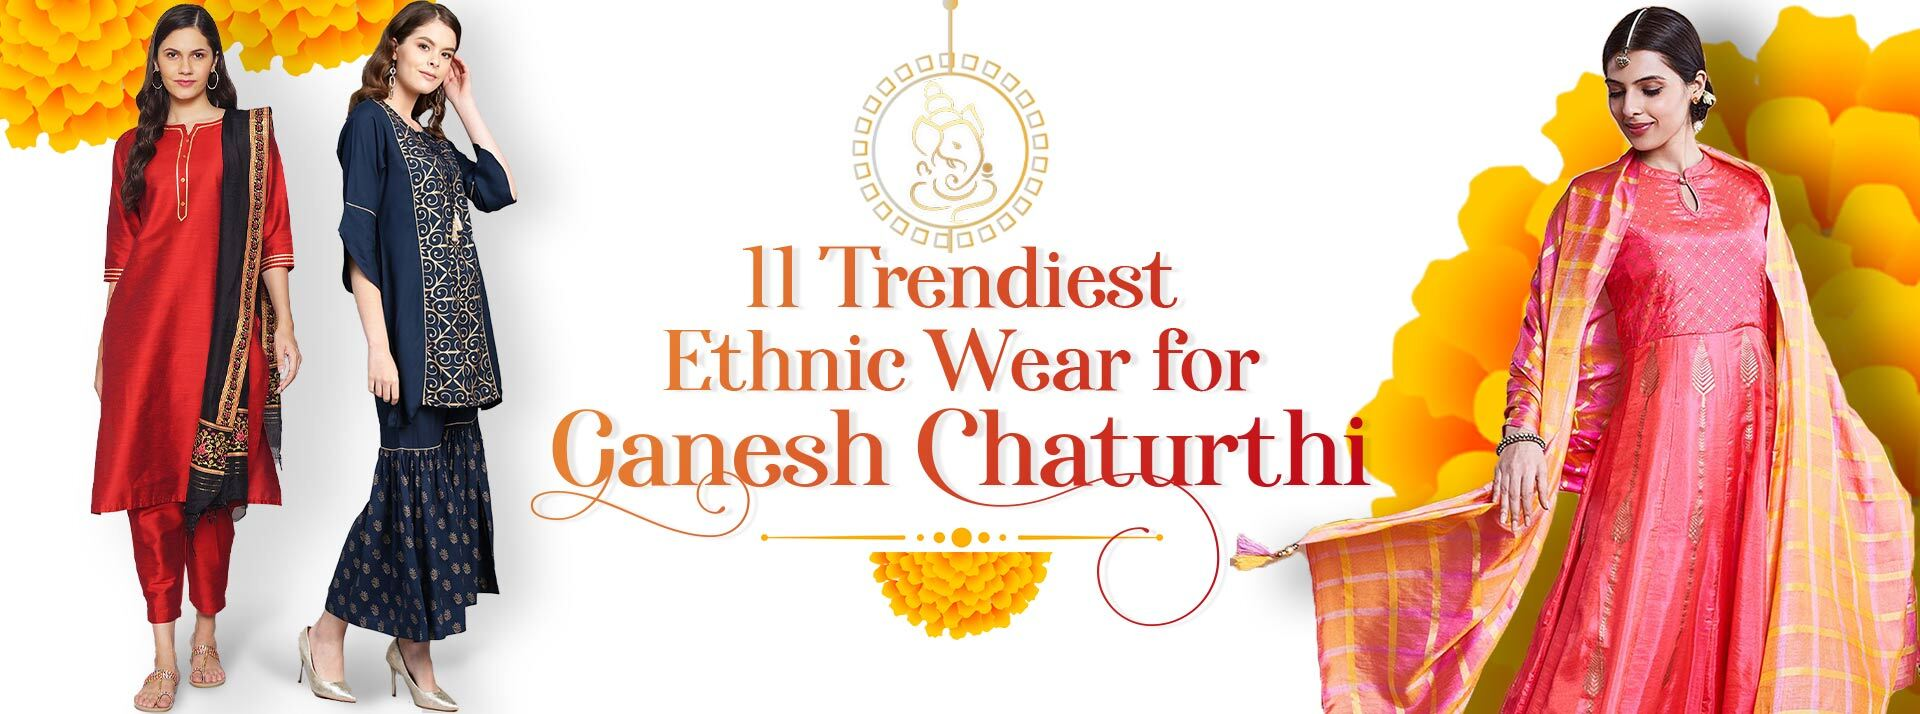 Ethnic Wear for Ganesh Chaturthi